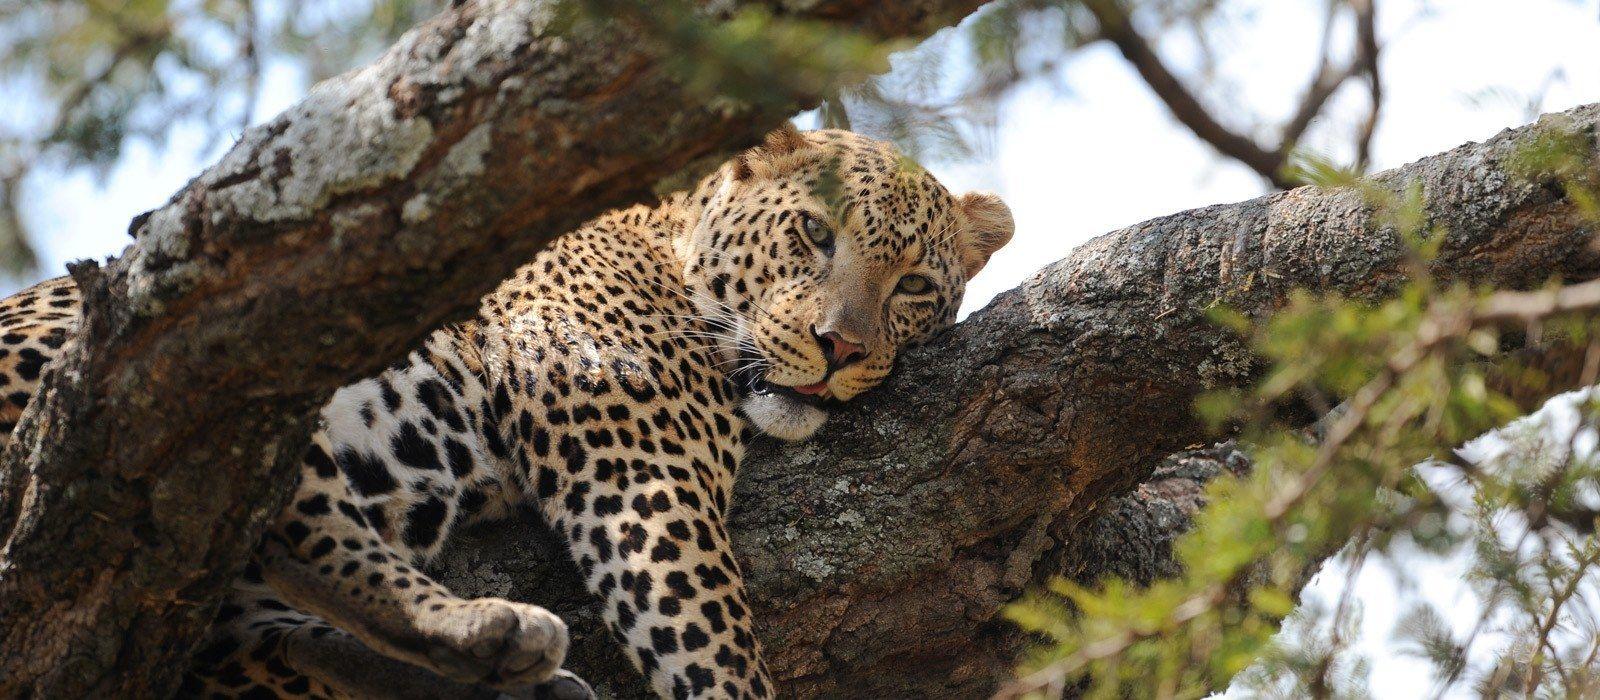 Destination Serengeti (Northern) Tanzania